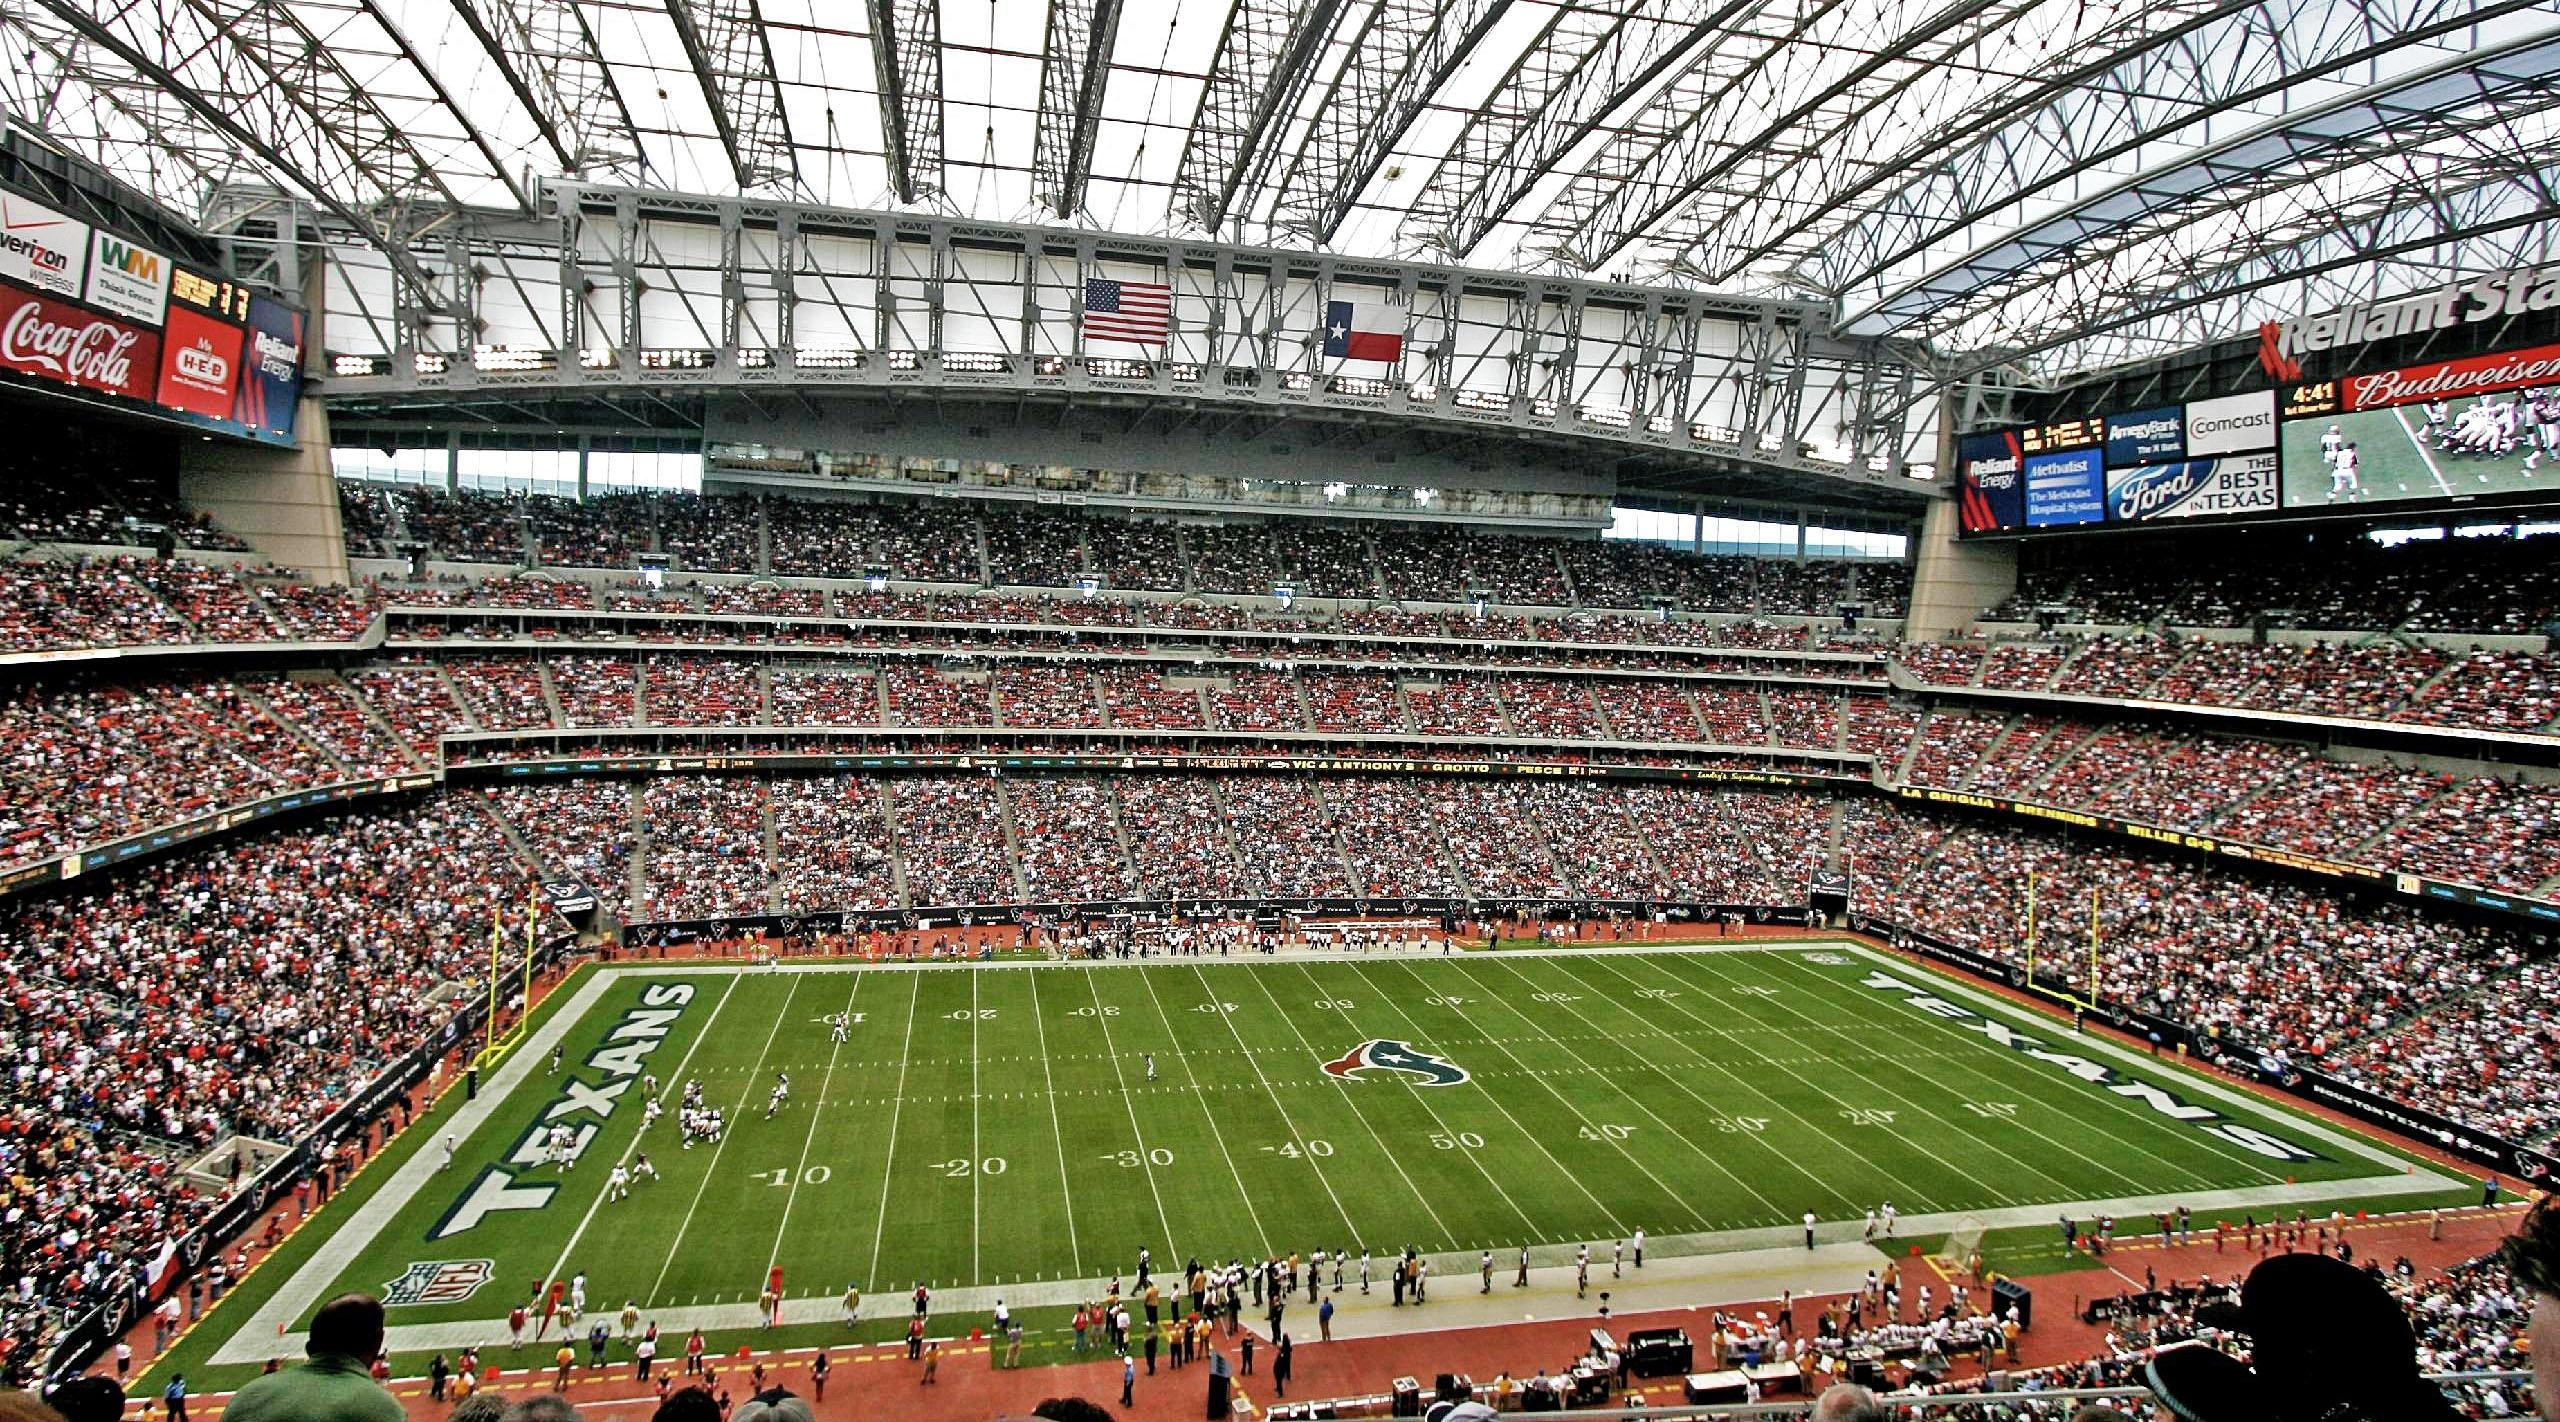 Nrg Stadium - Wikipedia for Super Bowl 53 Seating Capacity